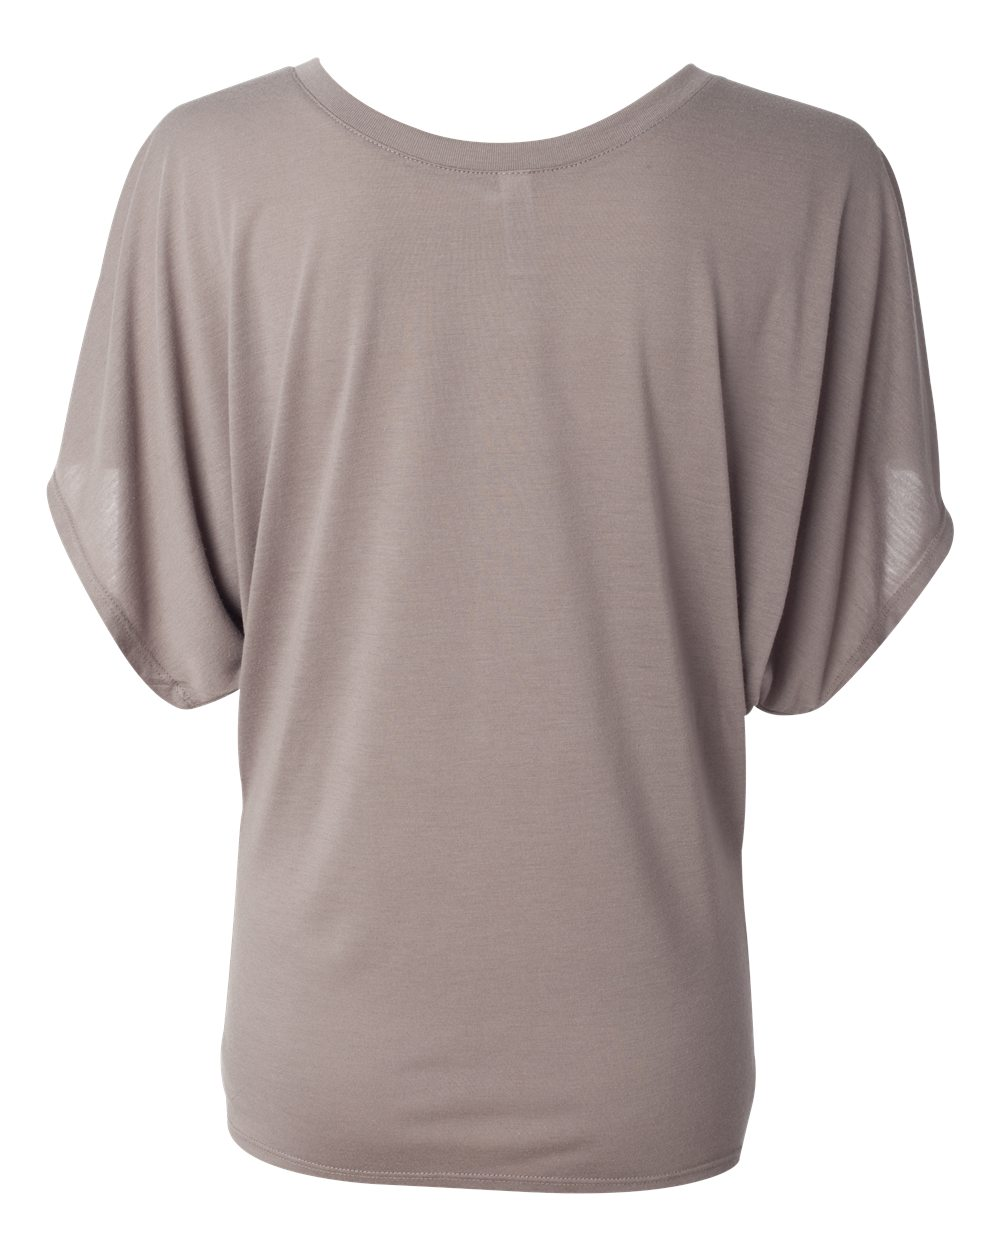 Bella-Canvas-Women-039-s-Flowy-Draped-Sleeve-Dolman-T-Shirt-8821-S-2XL thumbnail 7